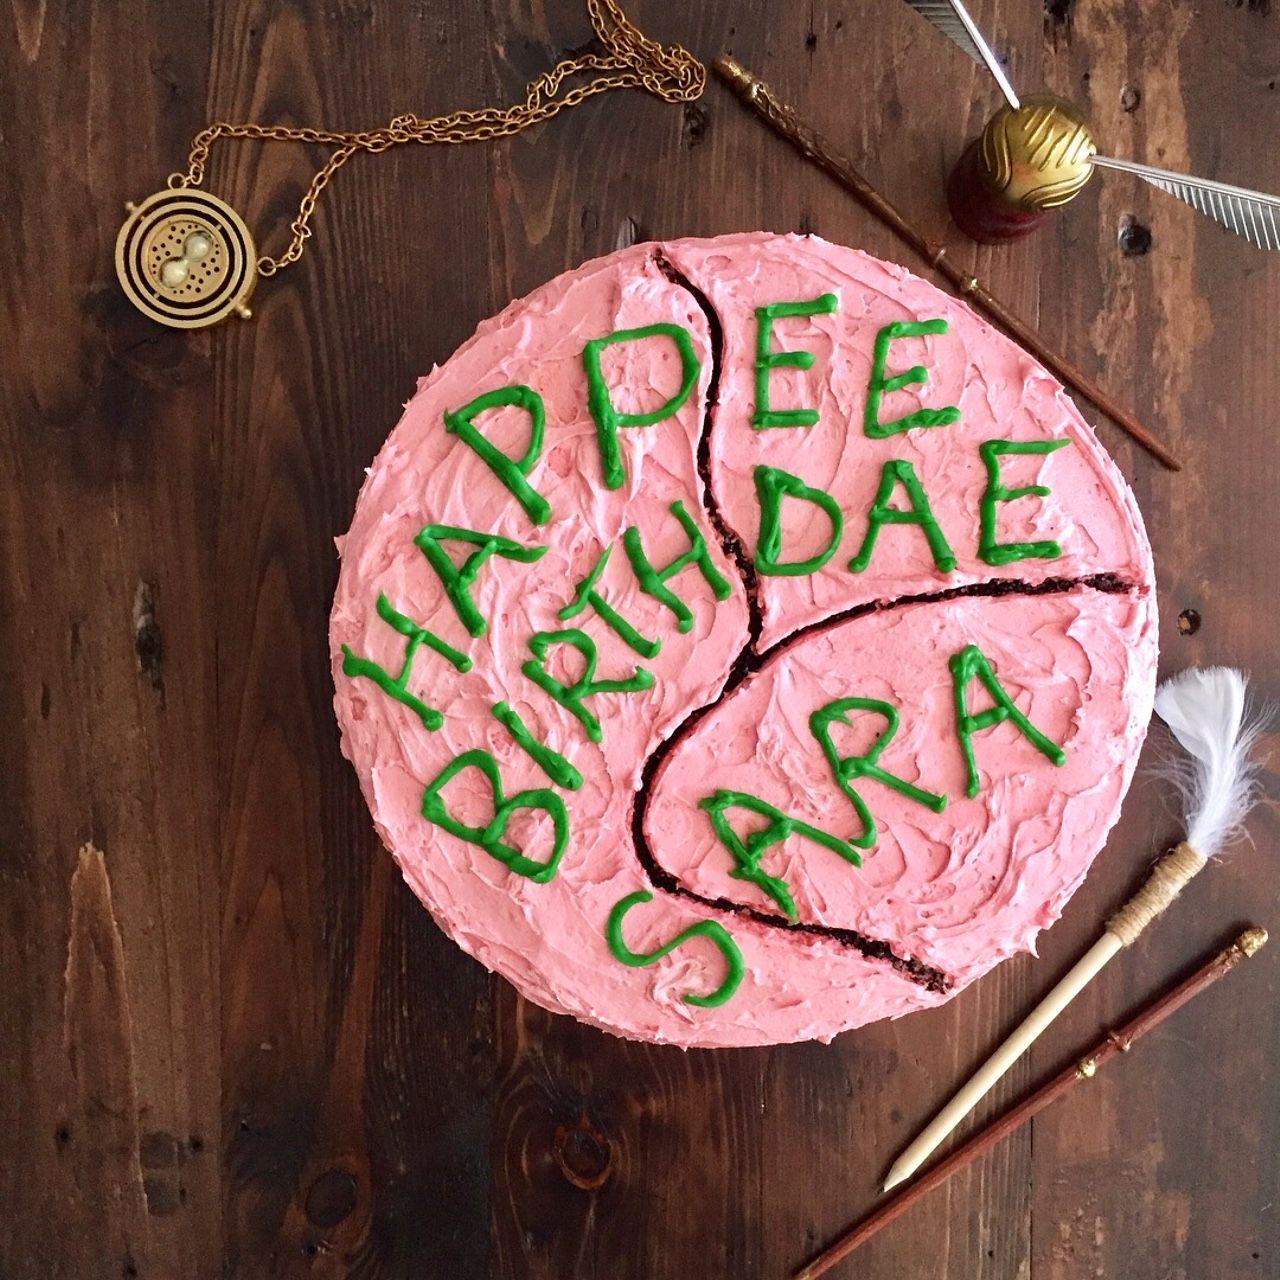 Harry Potter Birthday Cake Hagrids Cake To Harry Potter Harry